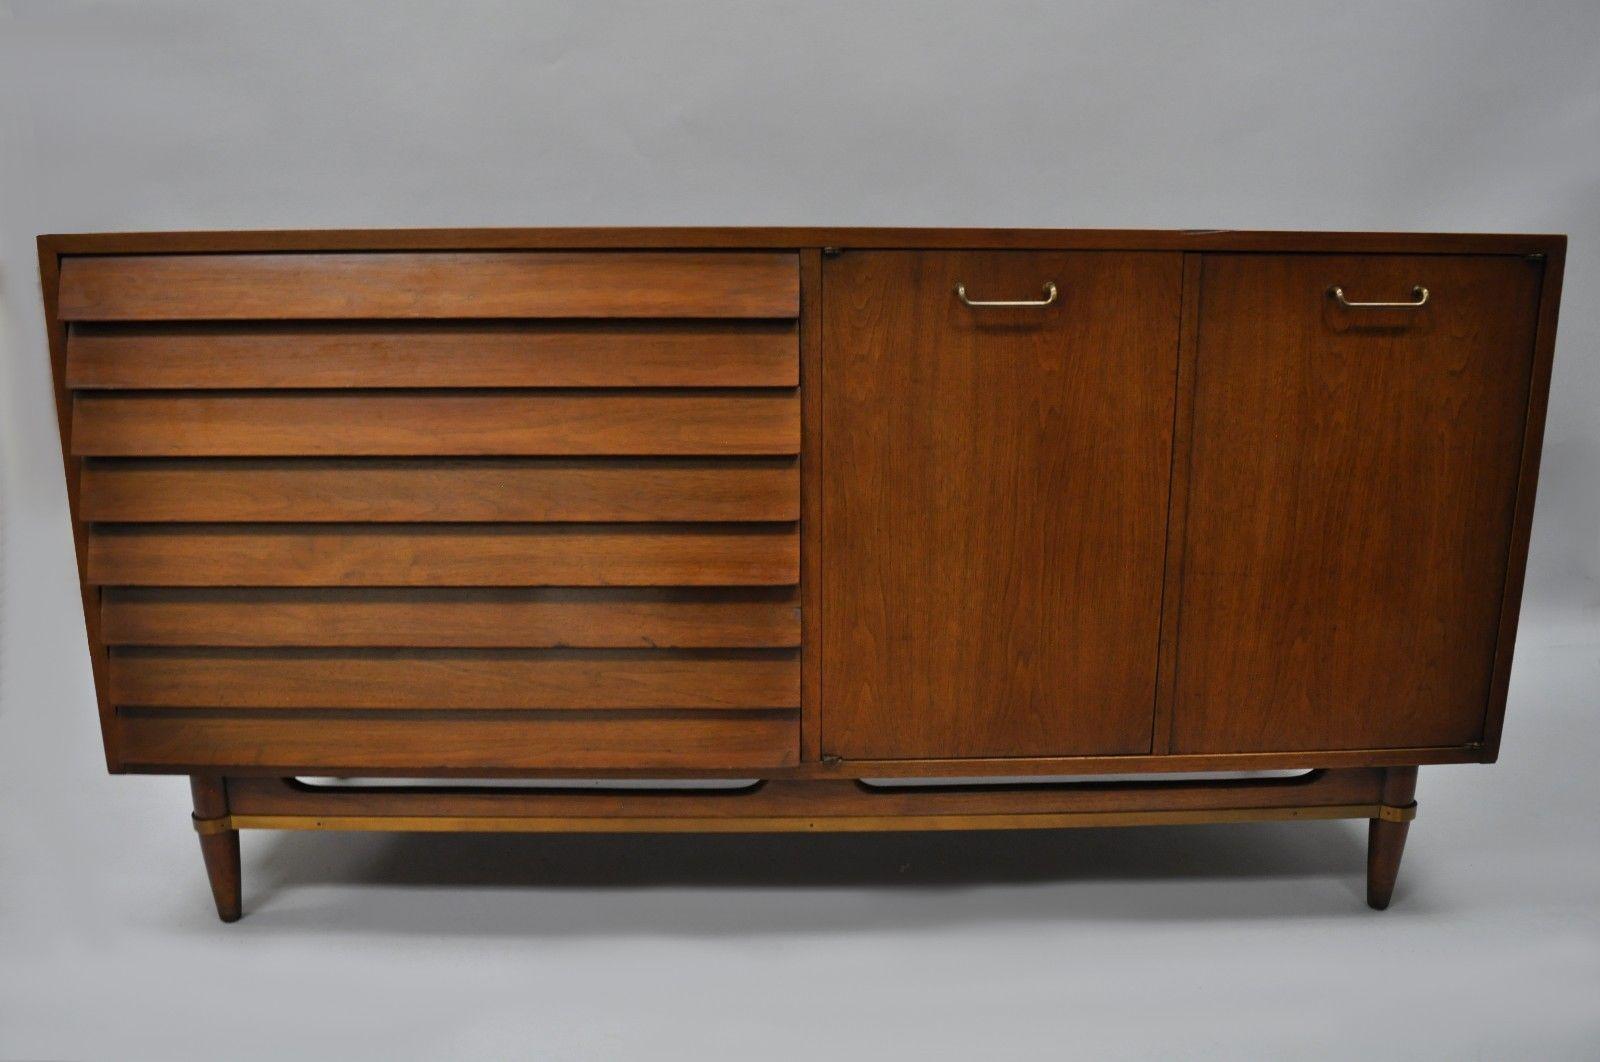 Credenza Mid Century Modern : American of martinsville louvered walnut dresser credenza mid